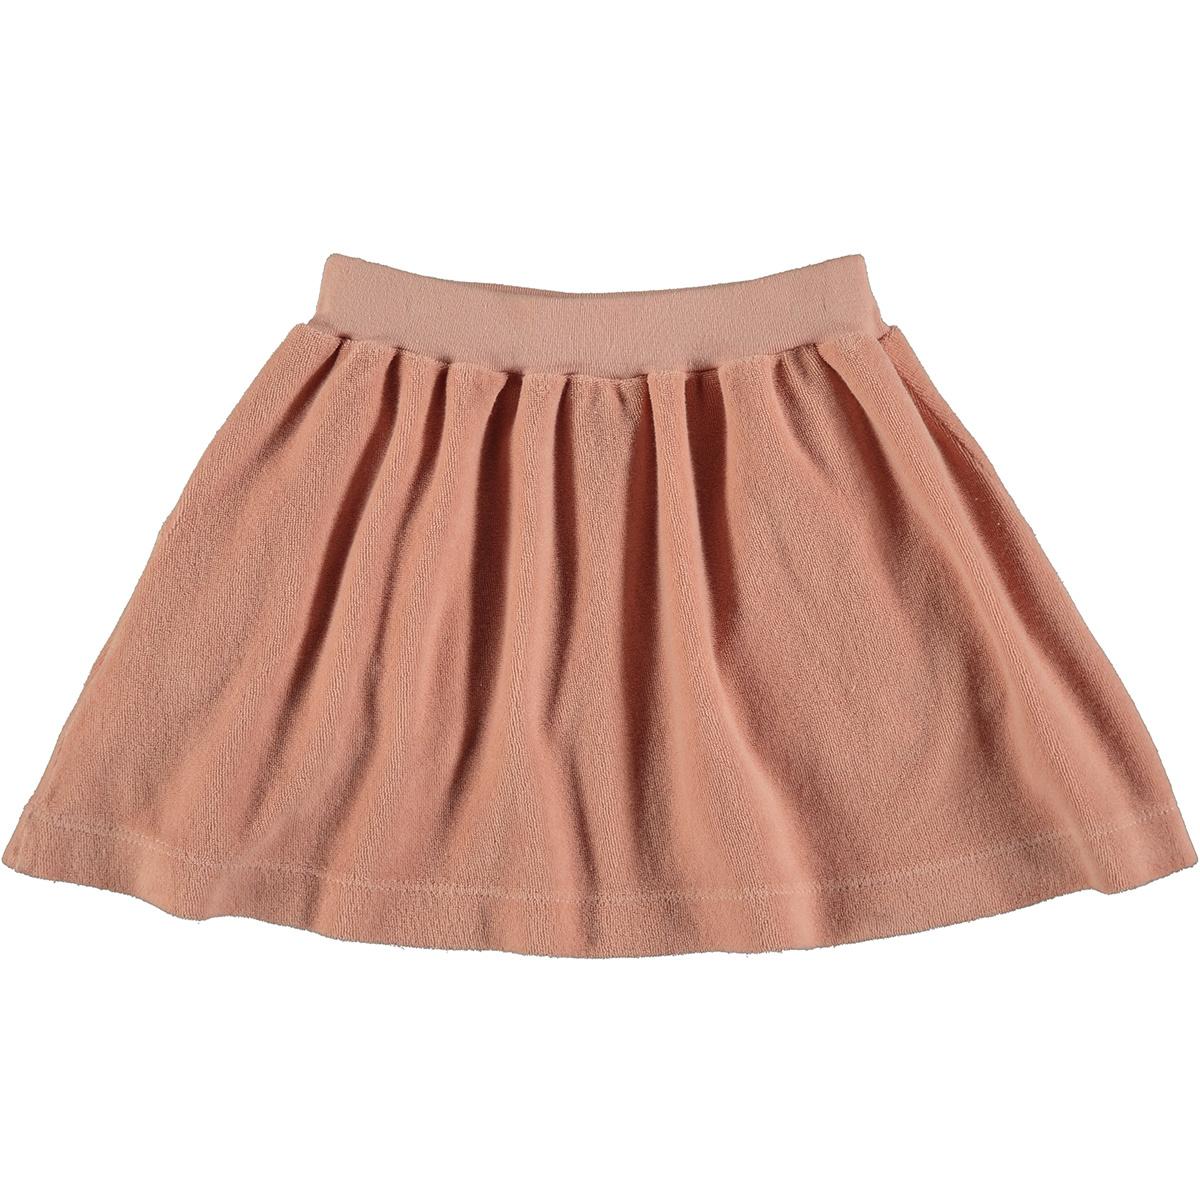 Skirt kid Sunbed - Dusty Pink-2